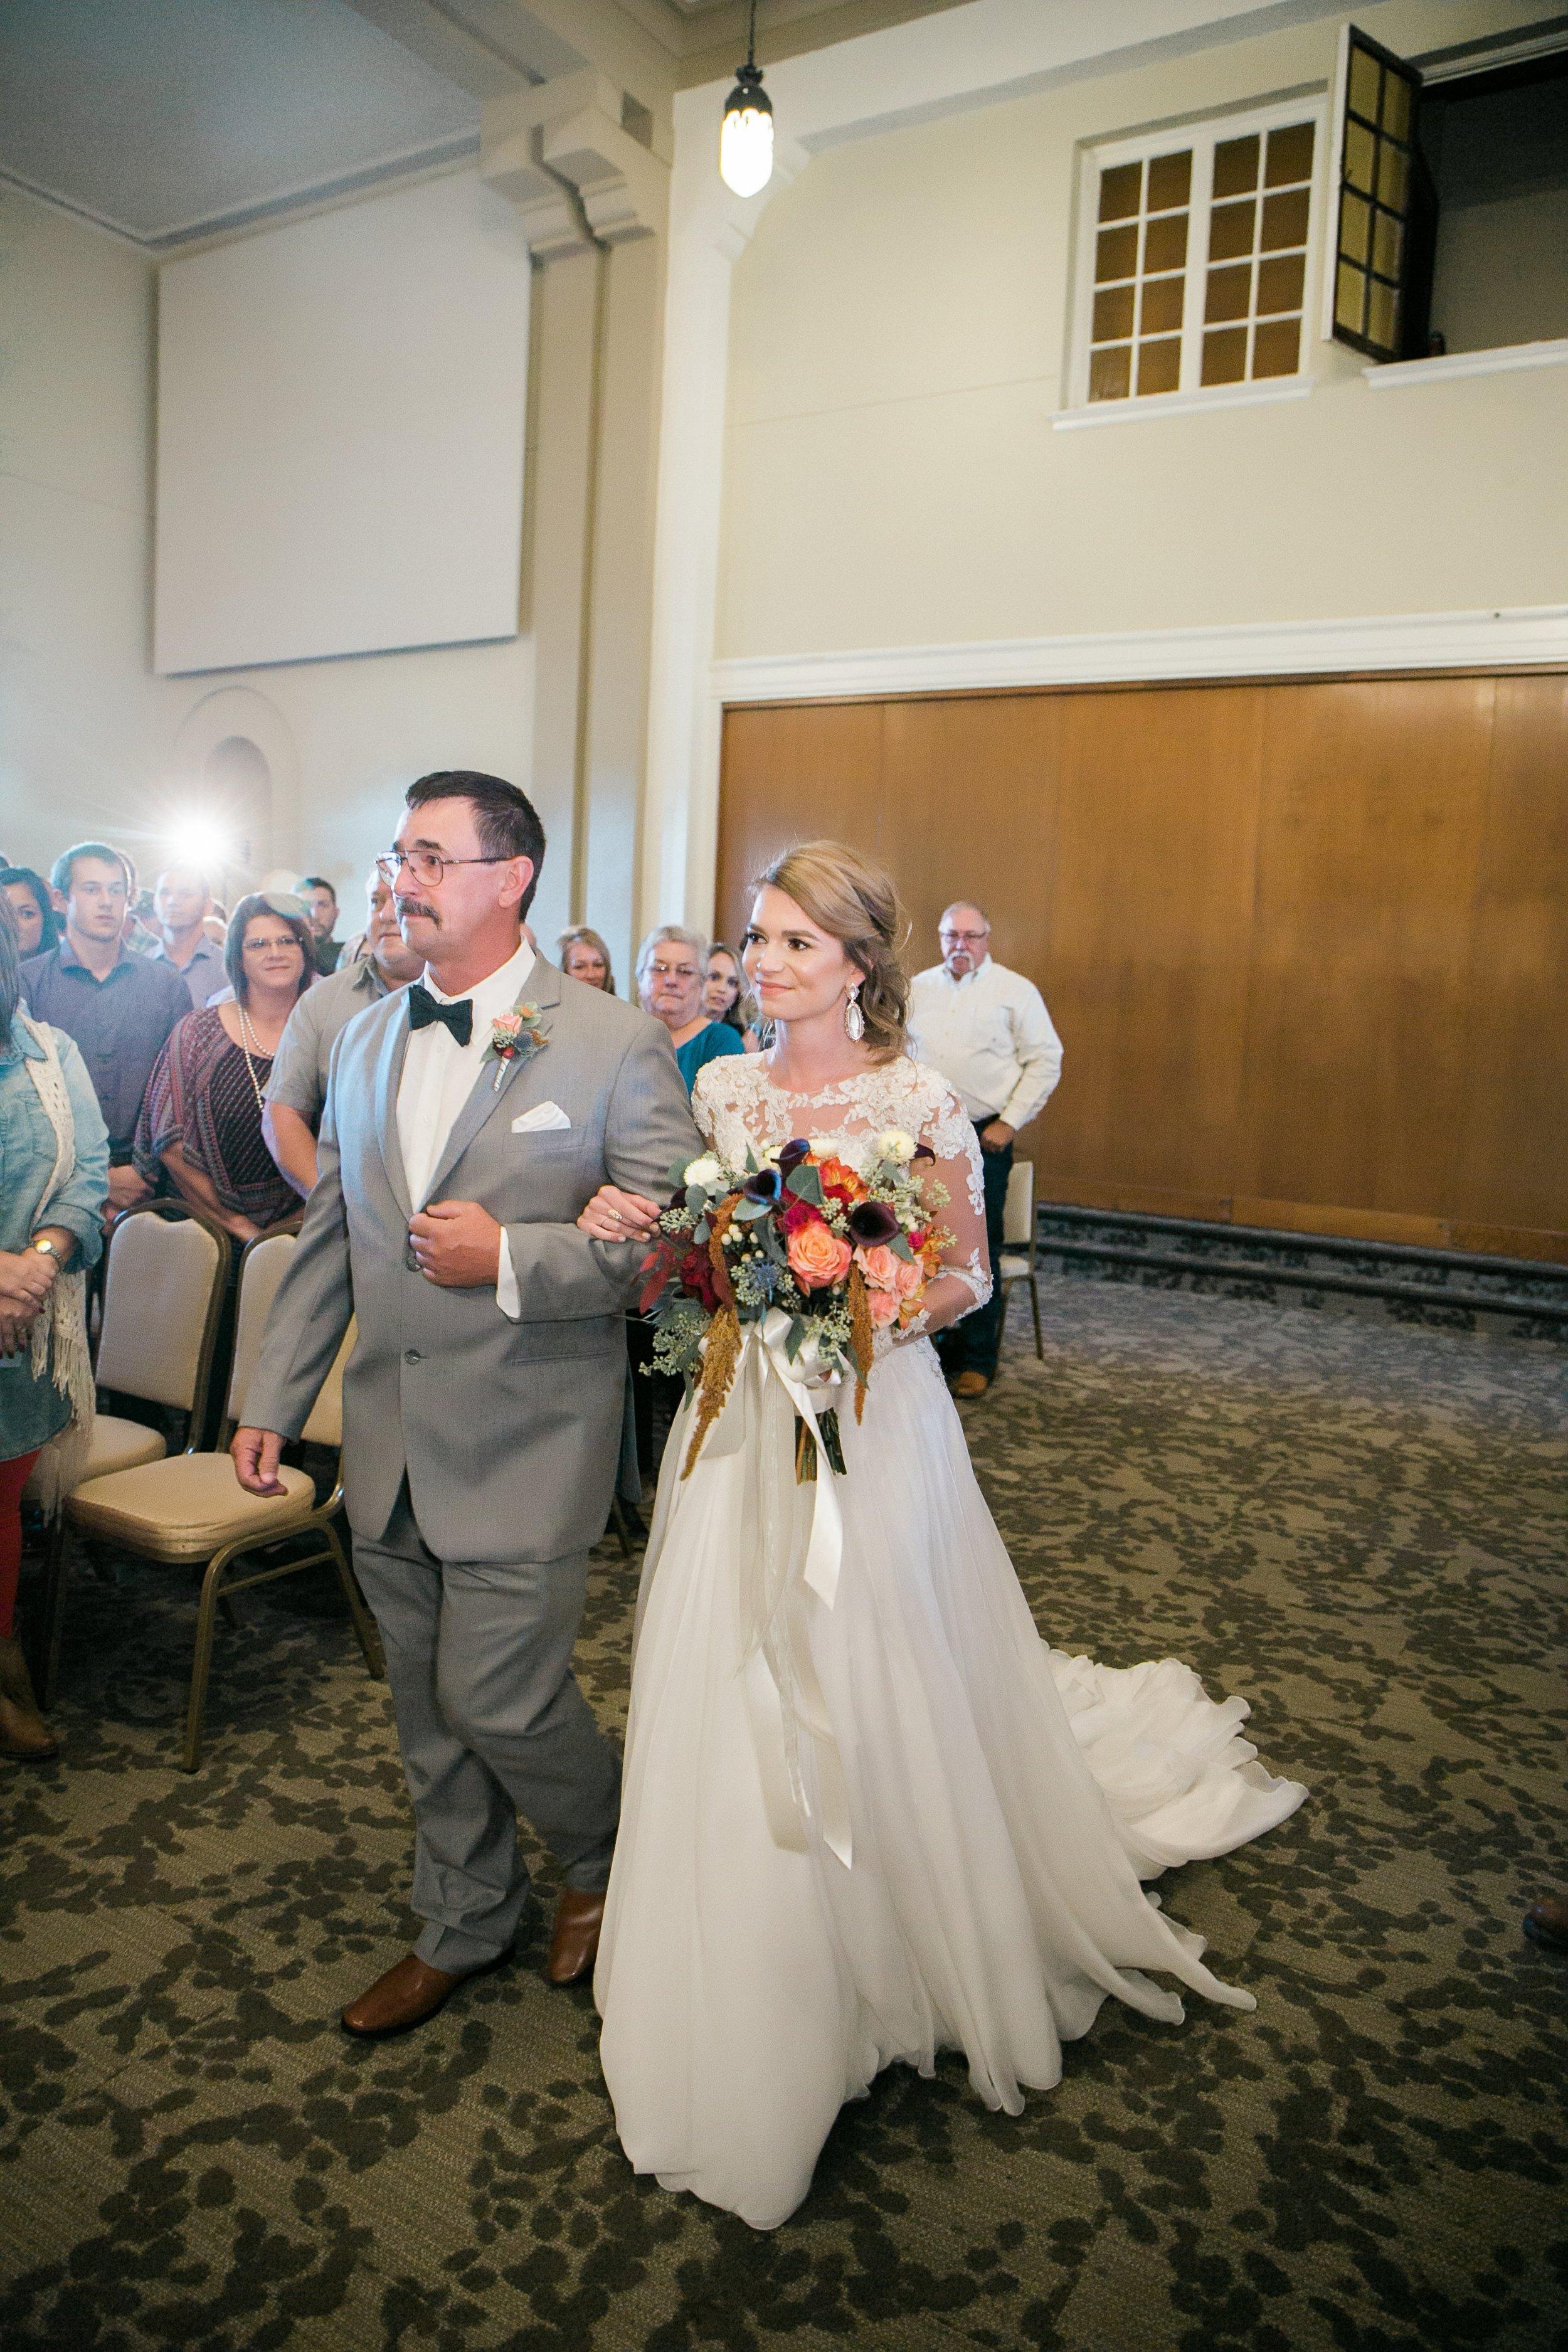 Roberson-Wedding-The-Forum-Lauren-Pinson-Wedding-Photography-Wichita-Falls-Texas-073.jpg